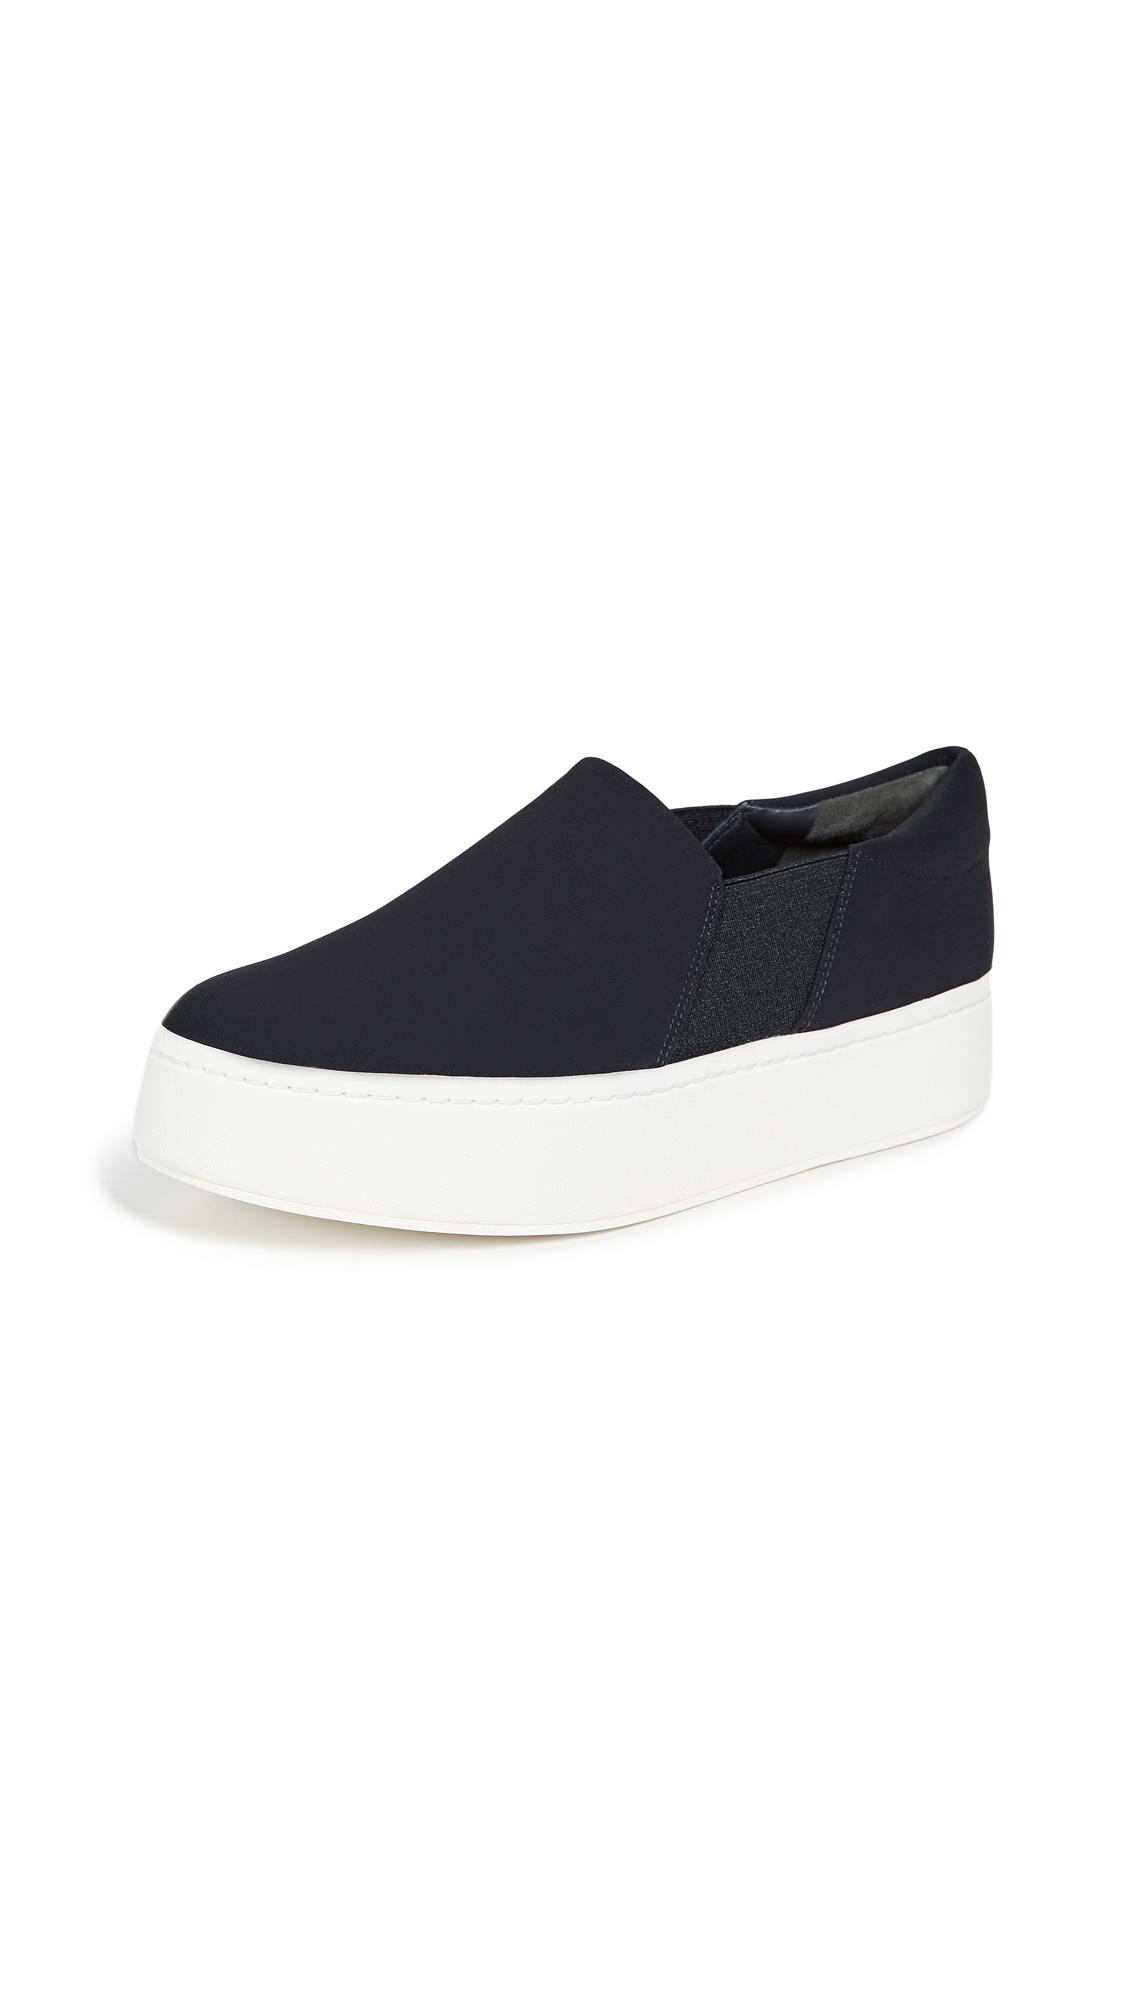 Vince Warren Platform Slip On Sneakers - Black